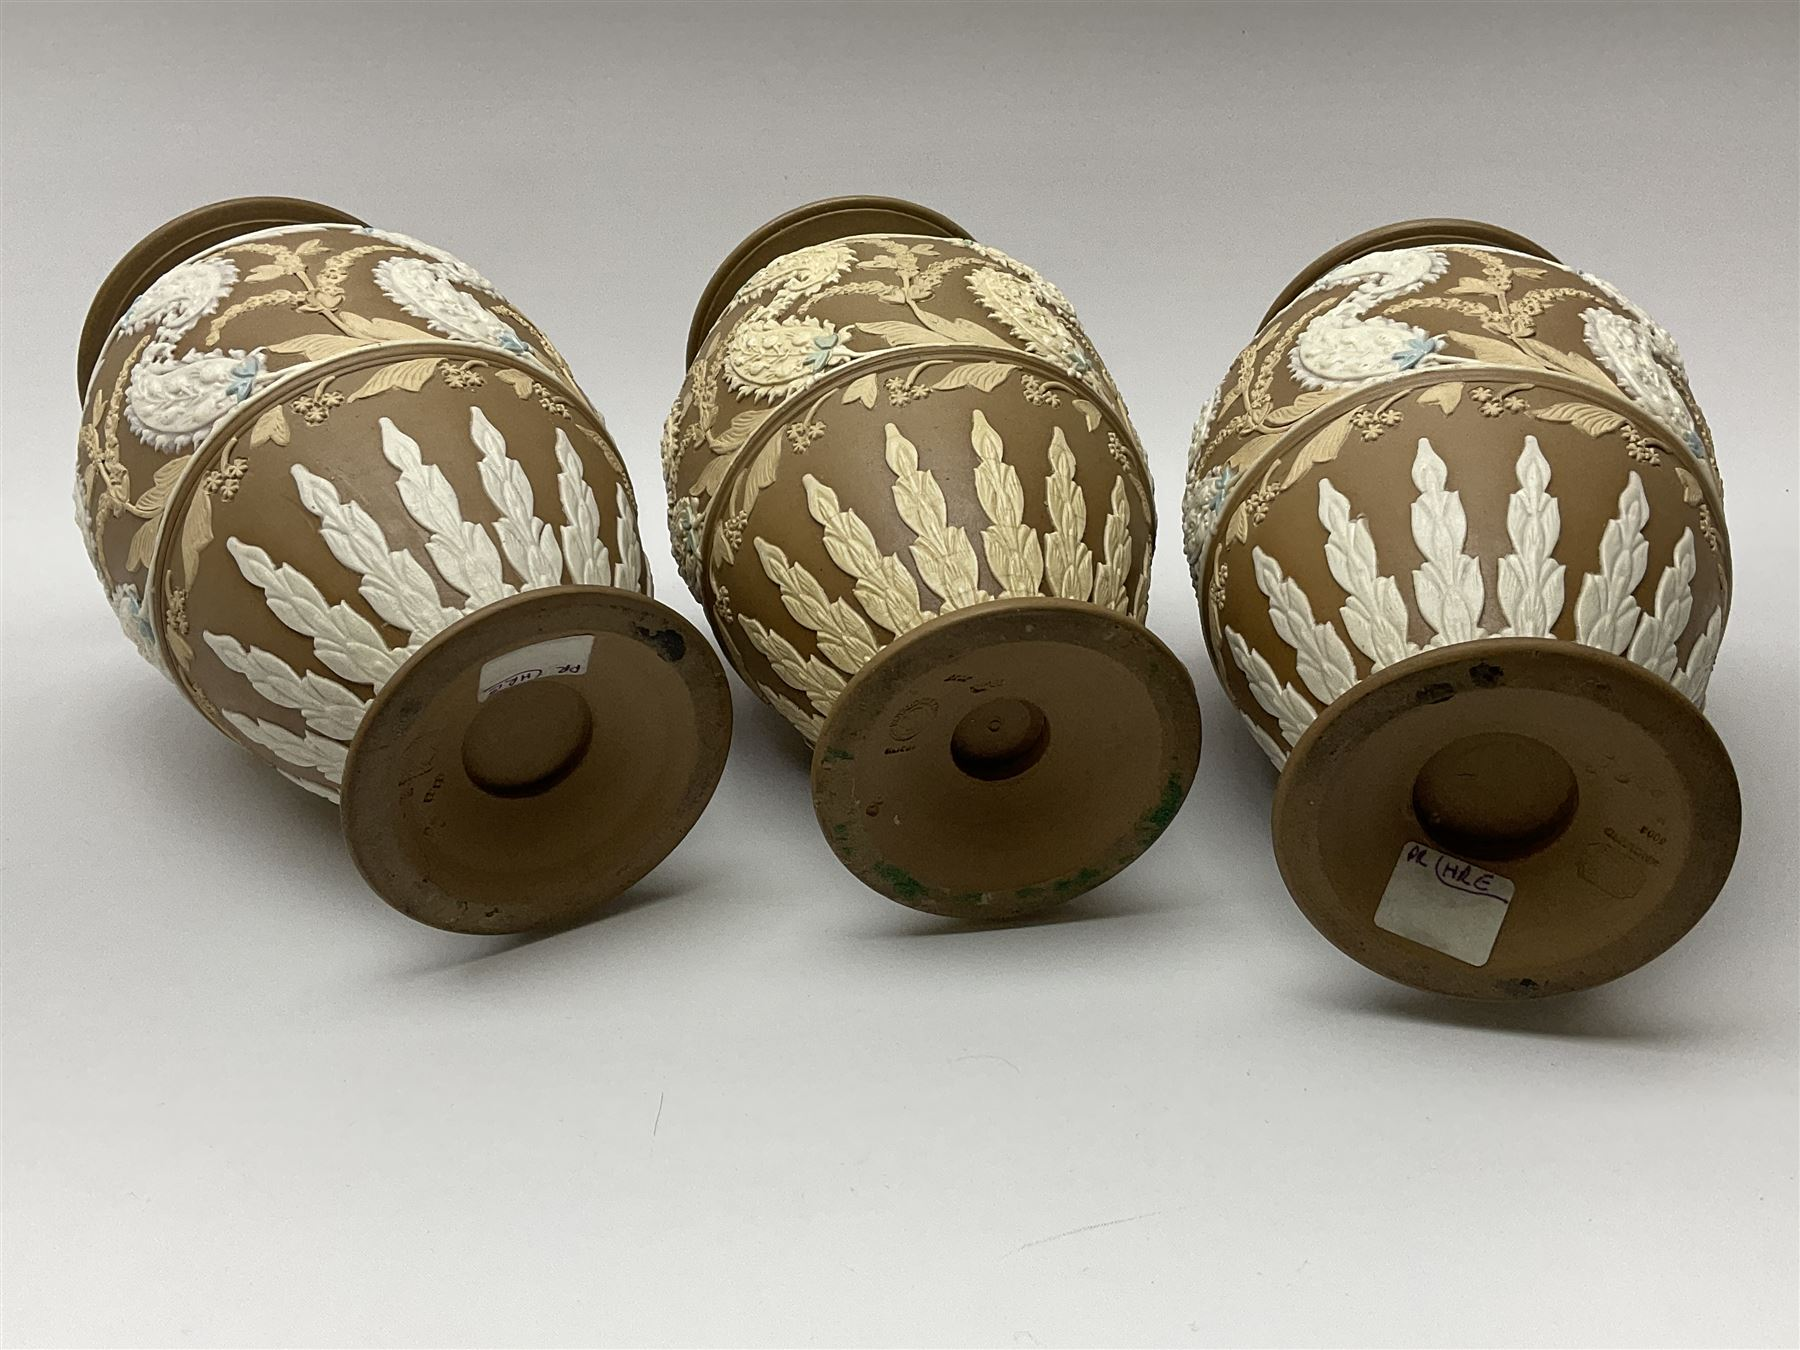 A set of three 19th century Doulton Lambeth silicon ware vases - Image 2 of 3